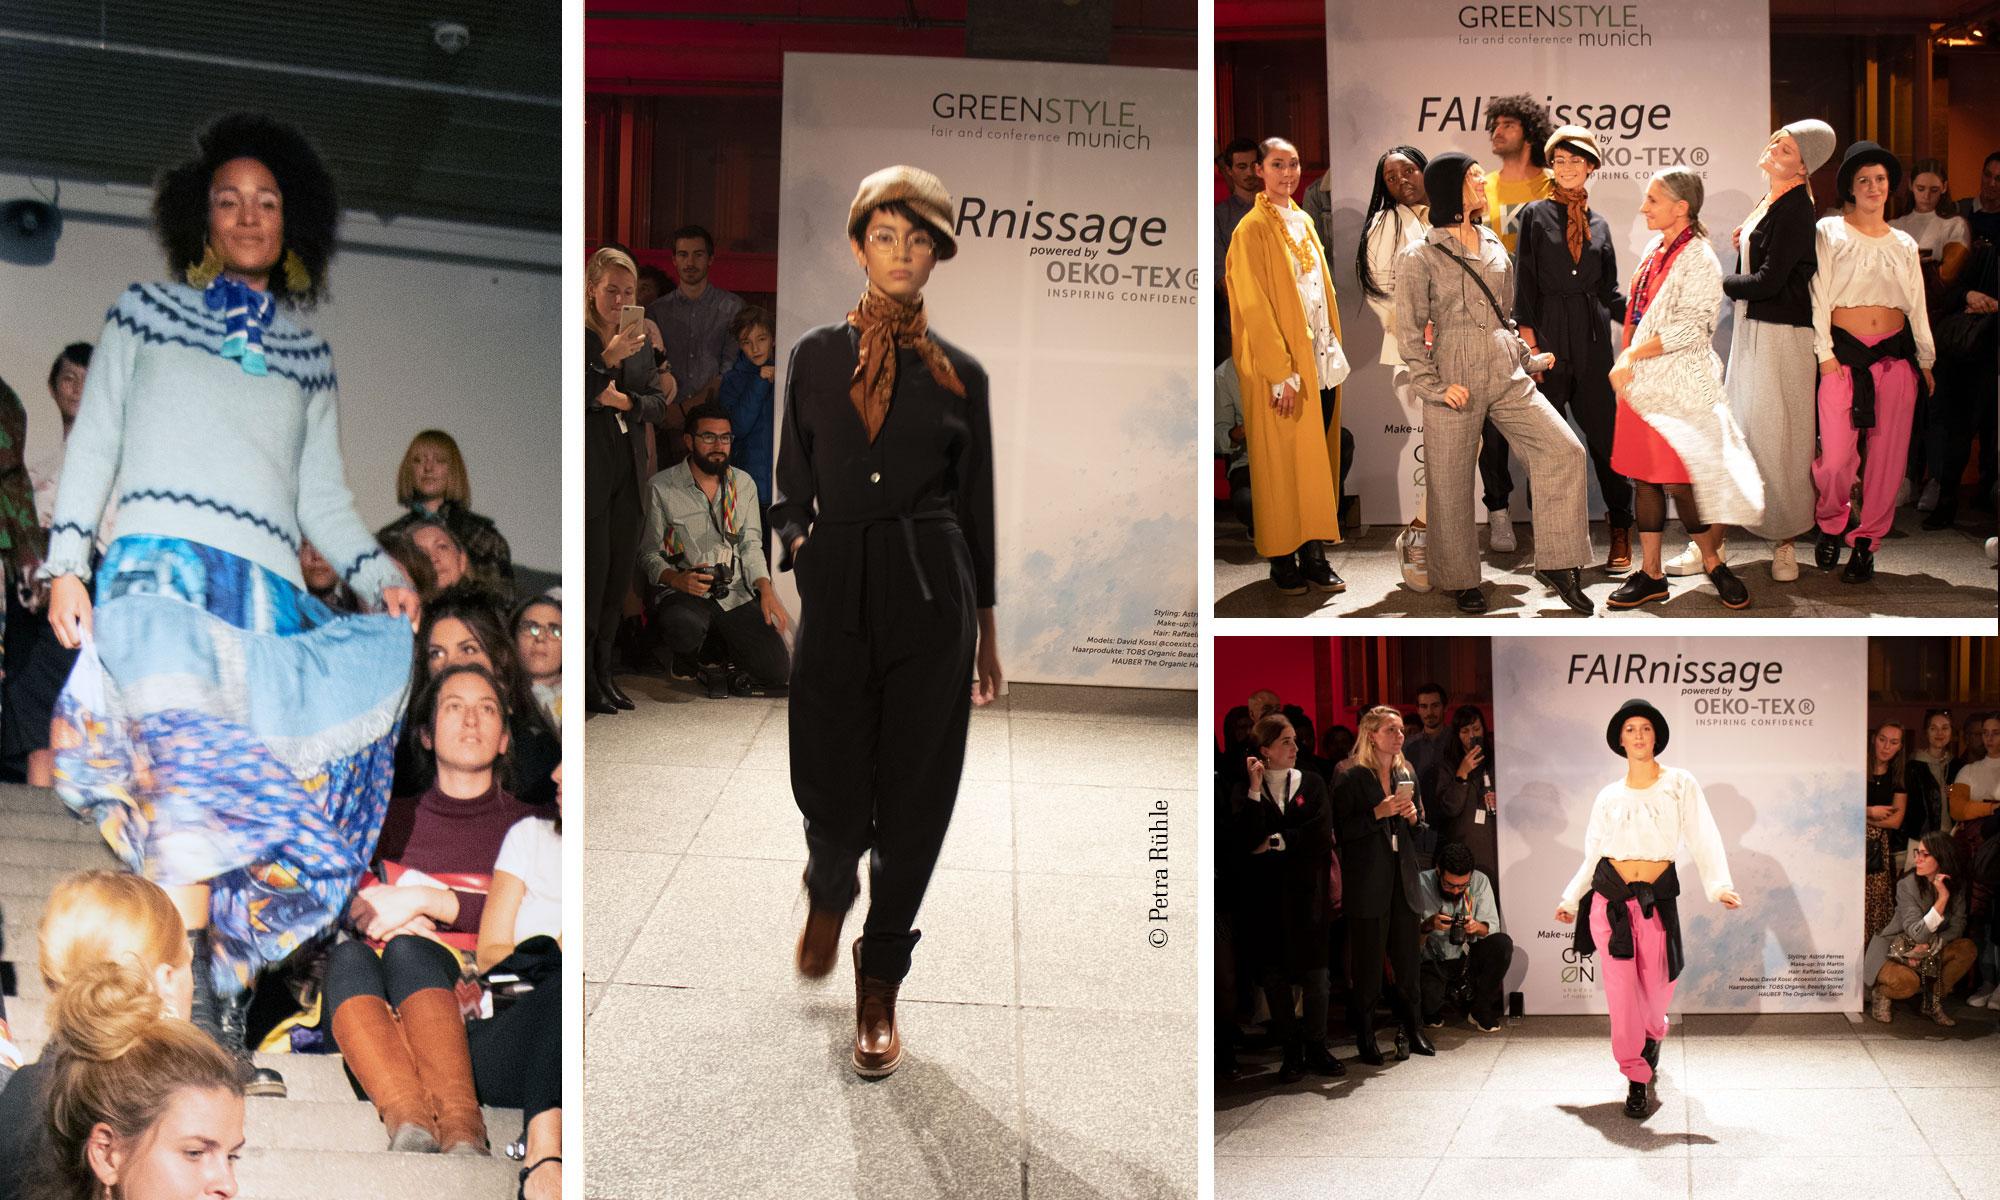 Fair Fashion & Conference